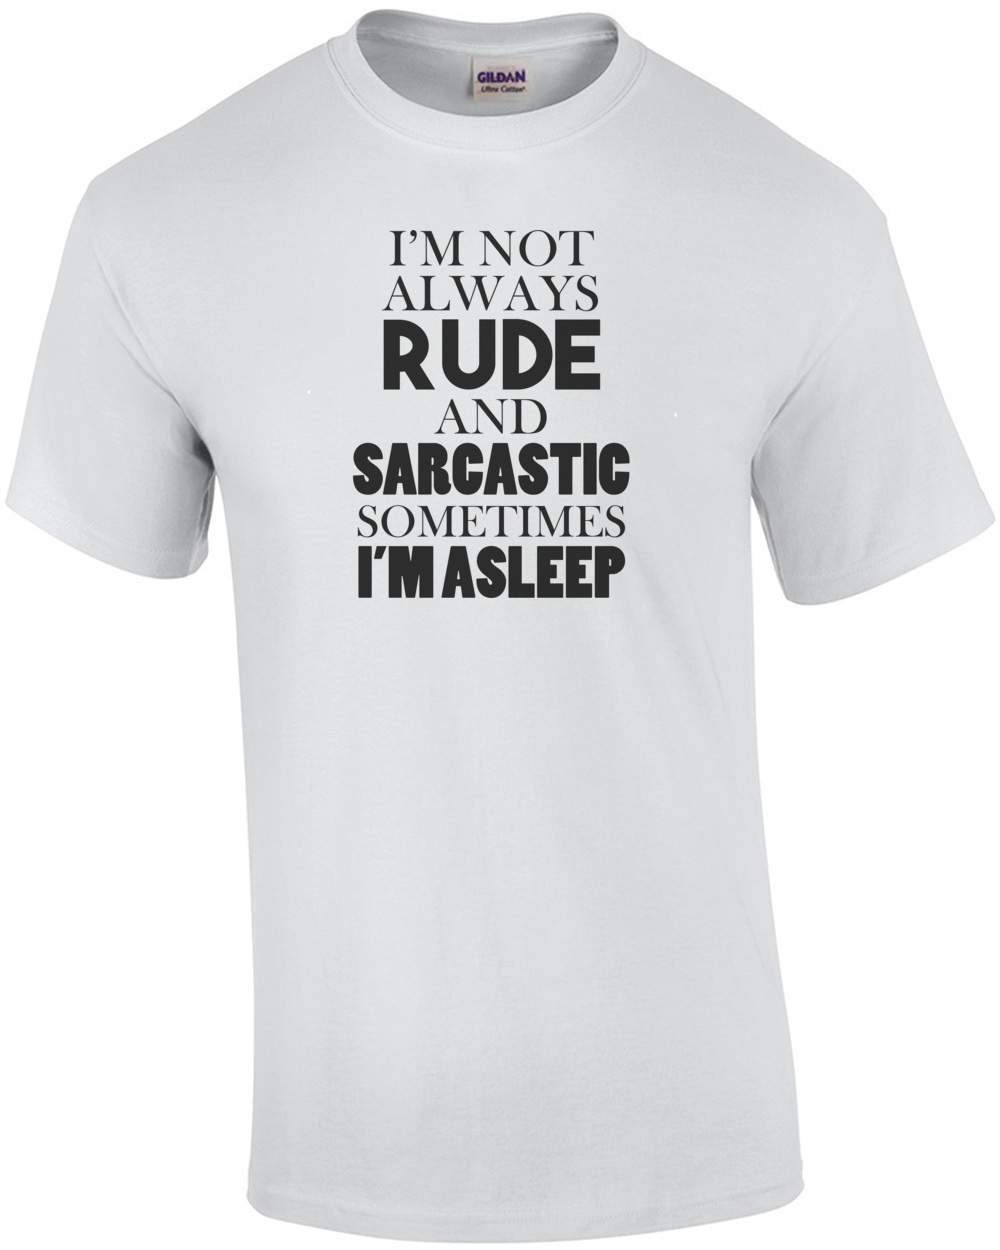 5efbff559 Inappropriate T Shirt Slogans - DREAMWORKS